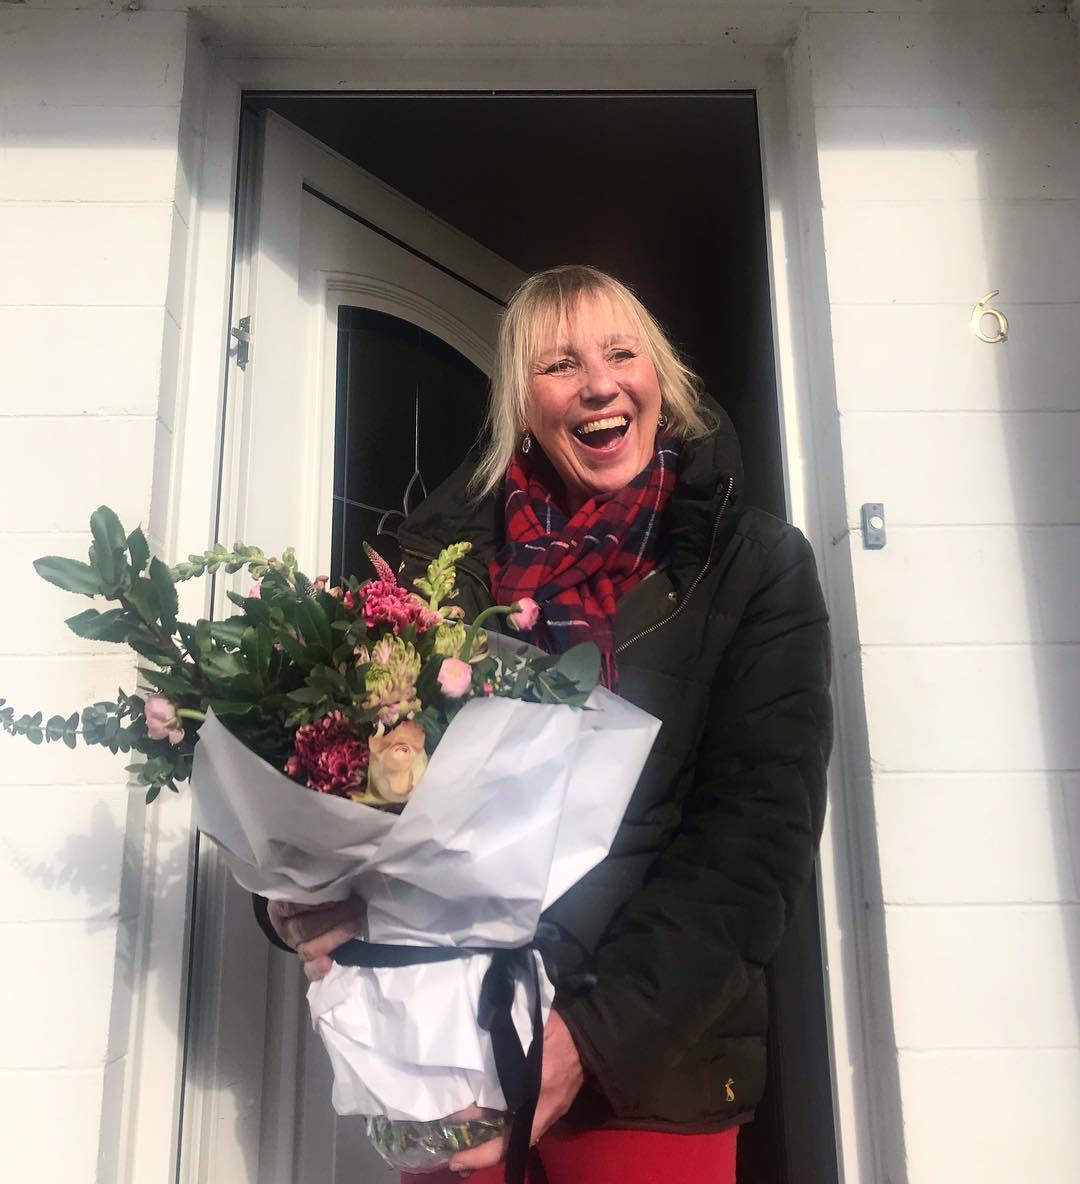 Mum receiving her Random Act of Flowers